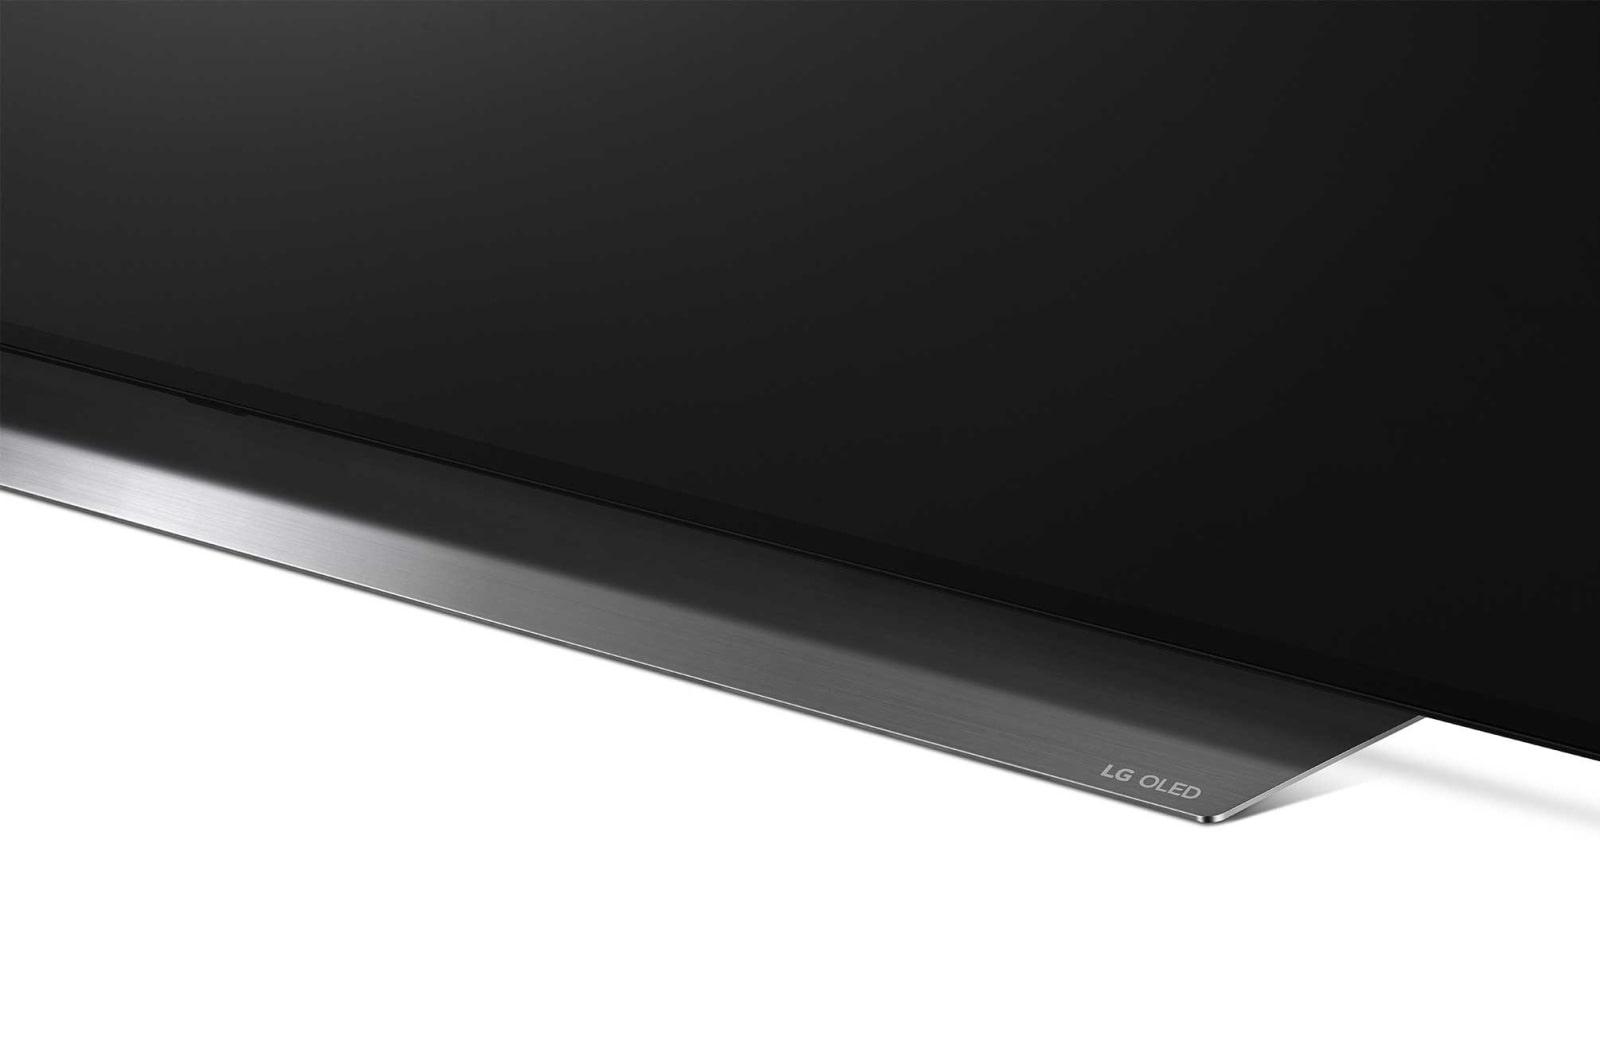 2e3309056 LG OLED55C9 - LG OLED TV - inteligentný procesor alpha 9 - LG ThinQ - 4K  OLED Smart TV LG - Slovenská republika